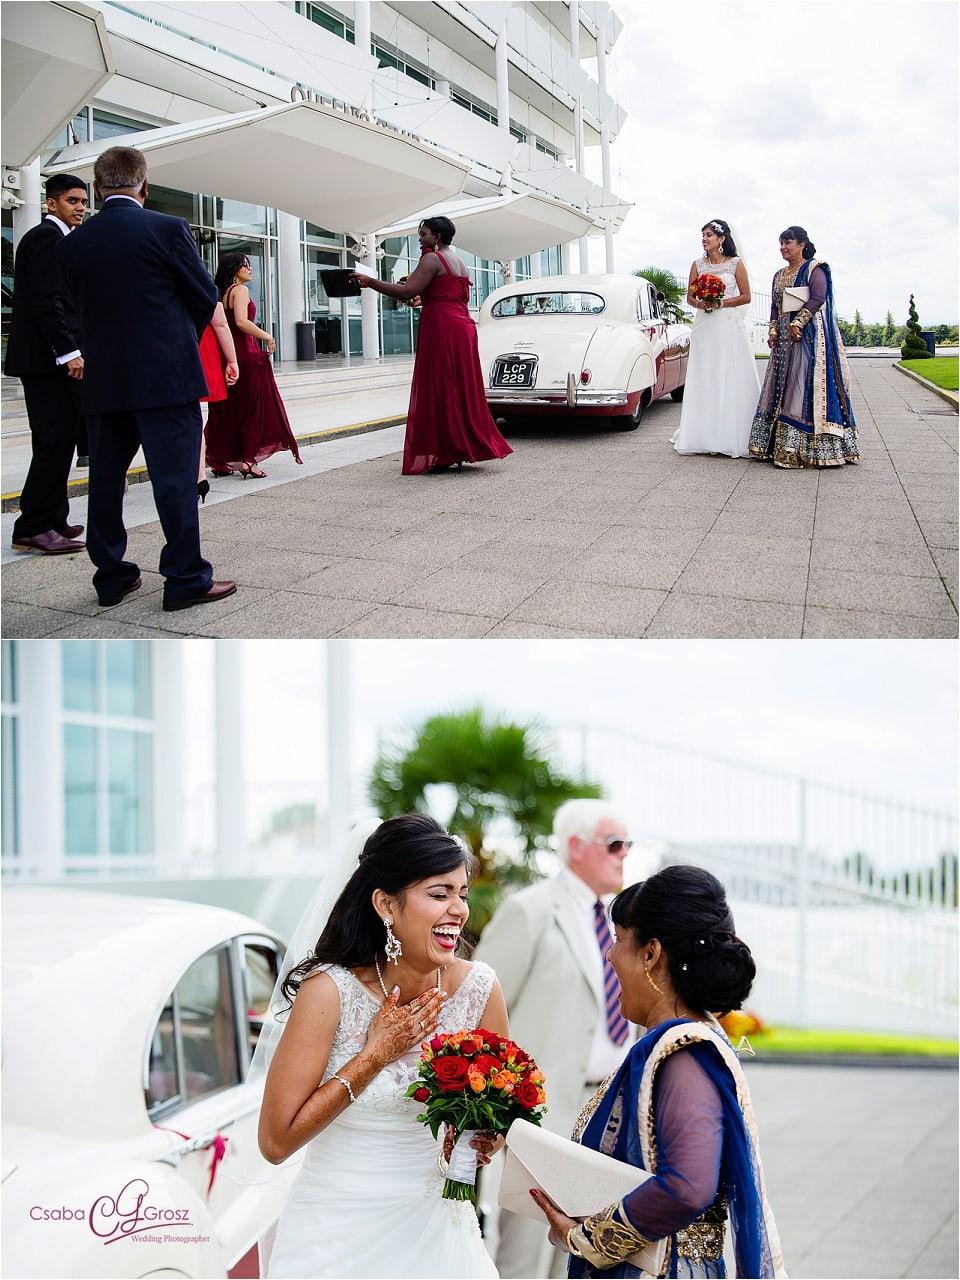 Parveen_Joseph_Wedding_at_Epsom_Downs_Wedding_Photographer_33